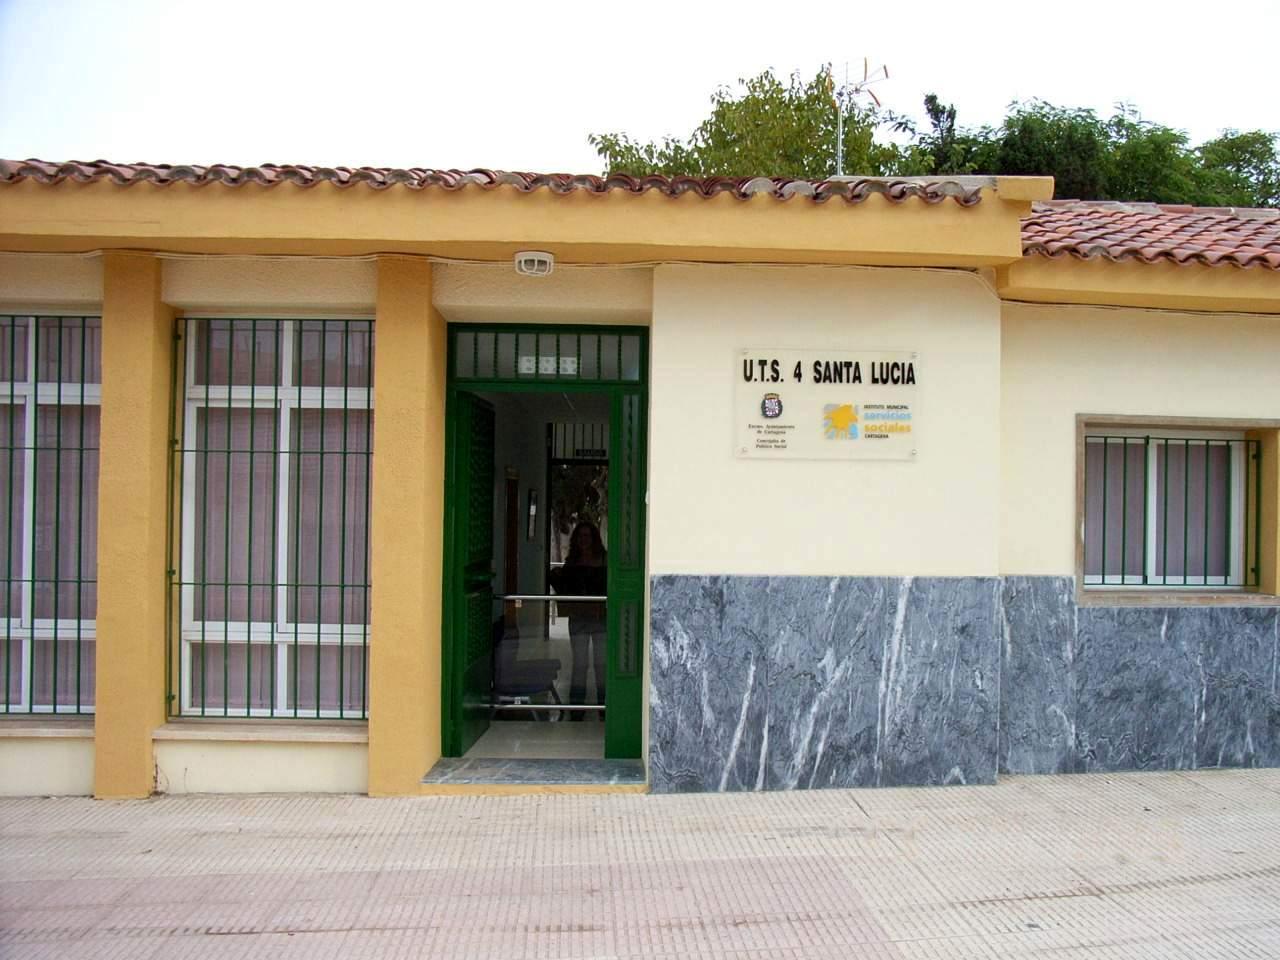 U.T.S. 4 - 'SANTA LUCÍA'